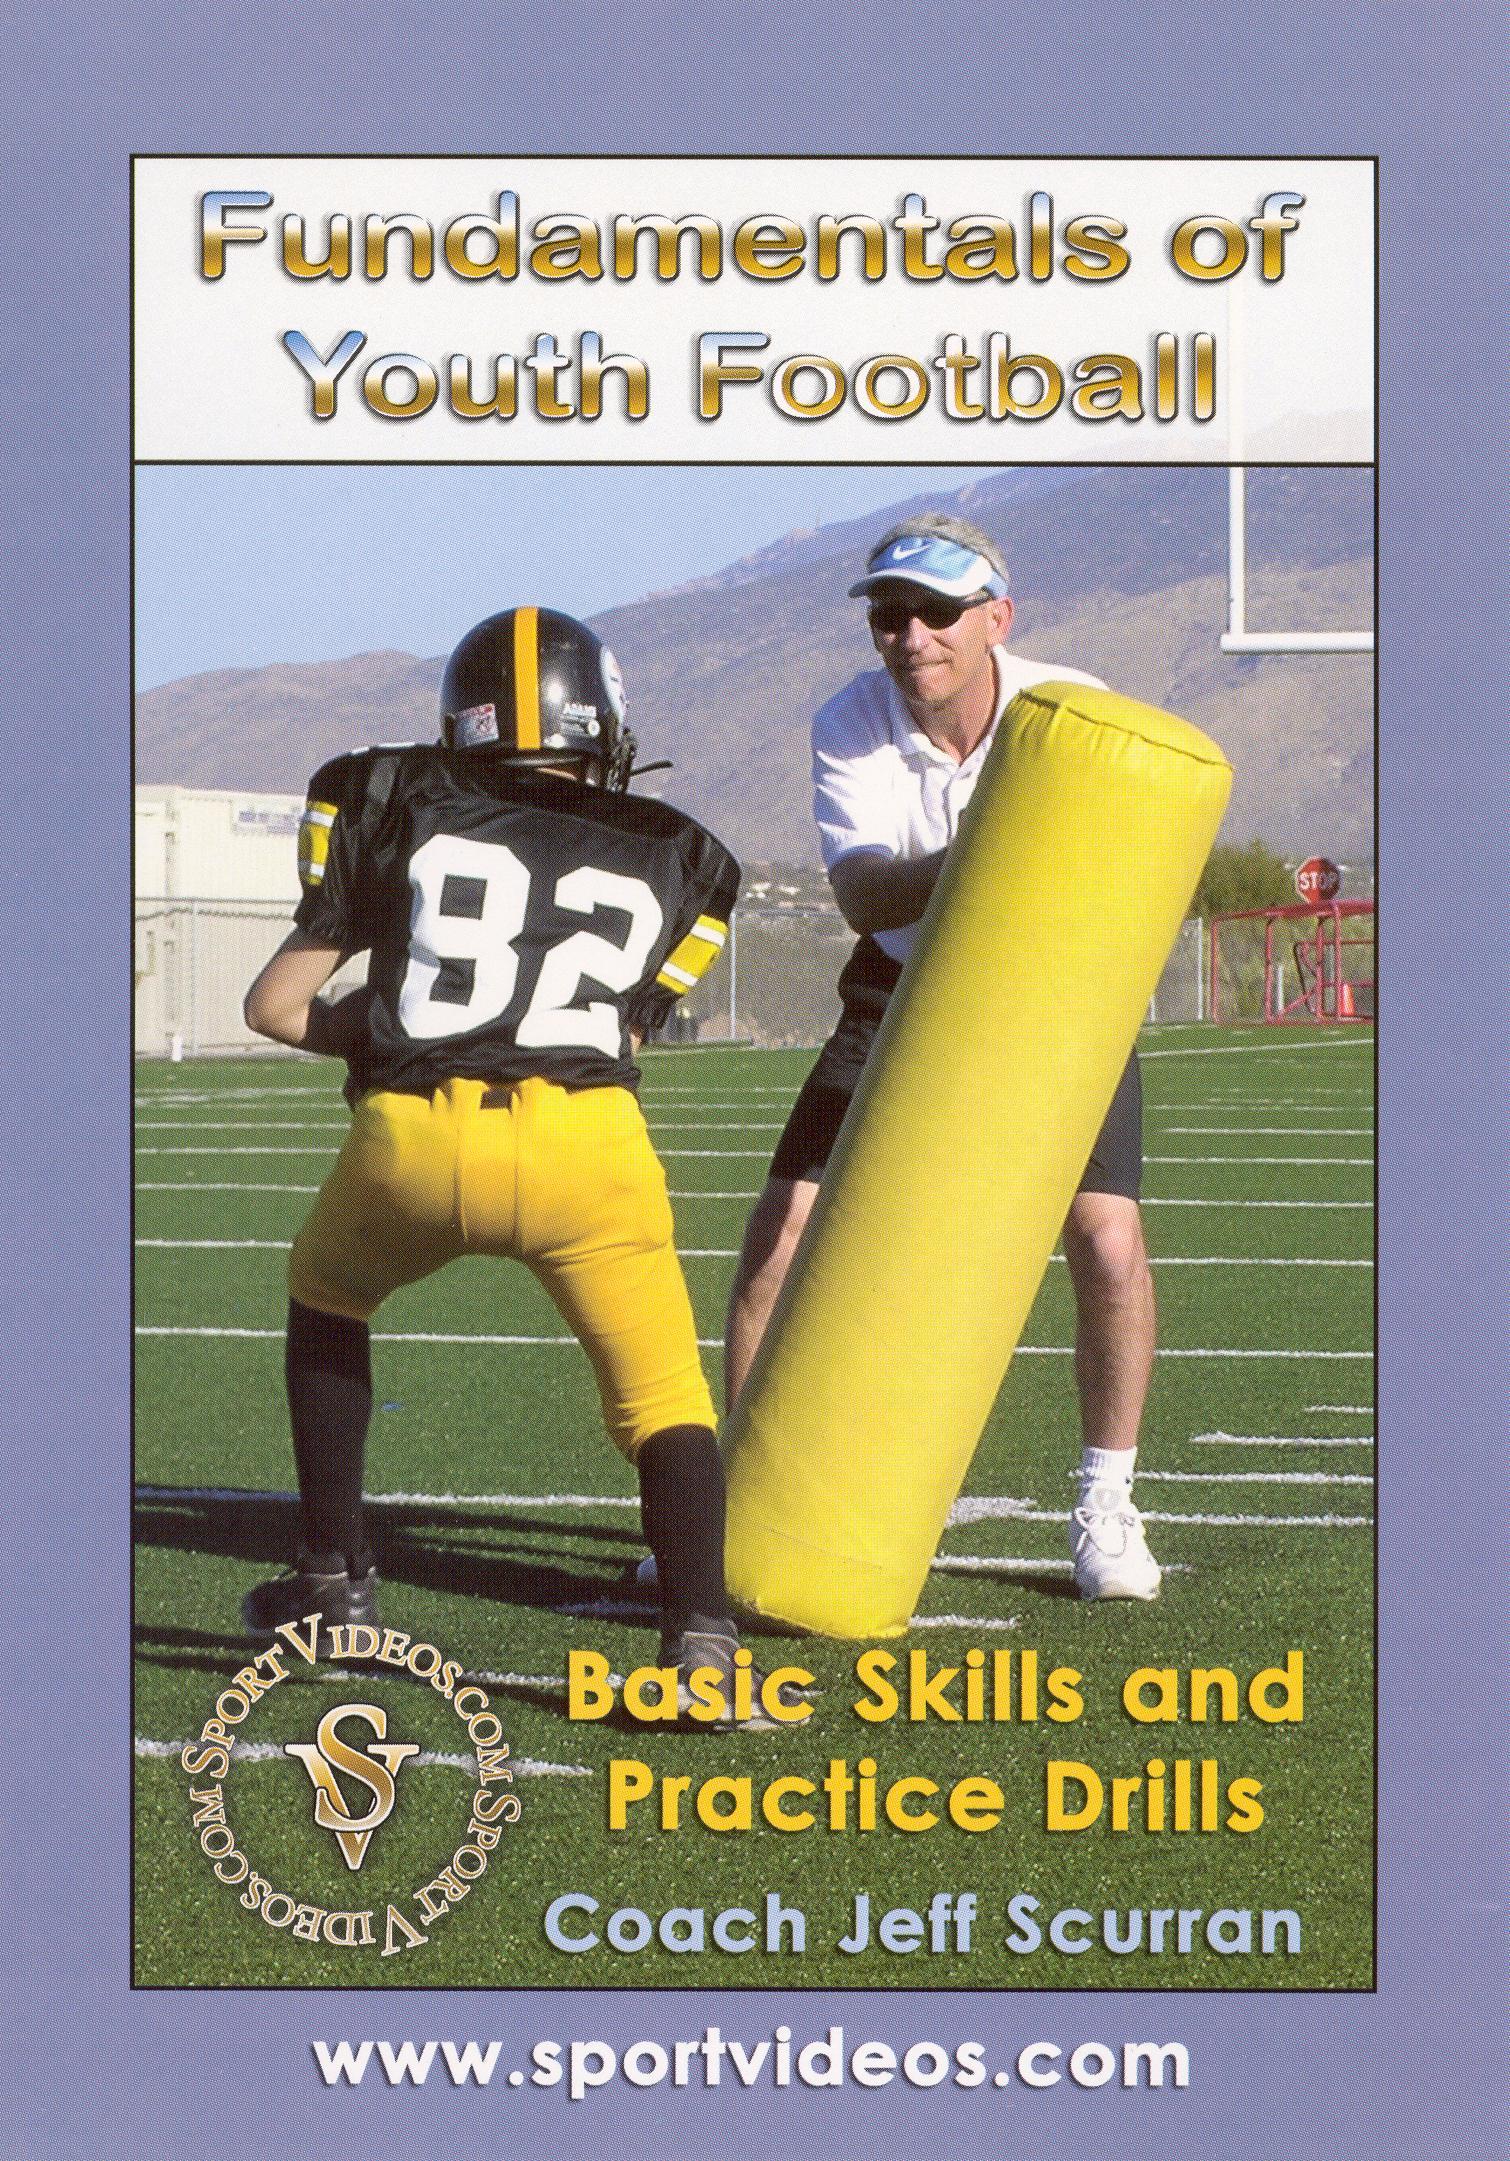 Fundamentals of Youth Football